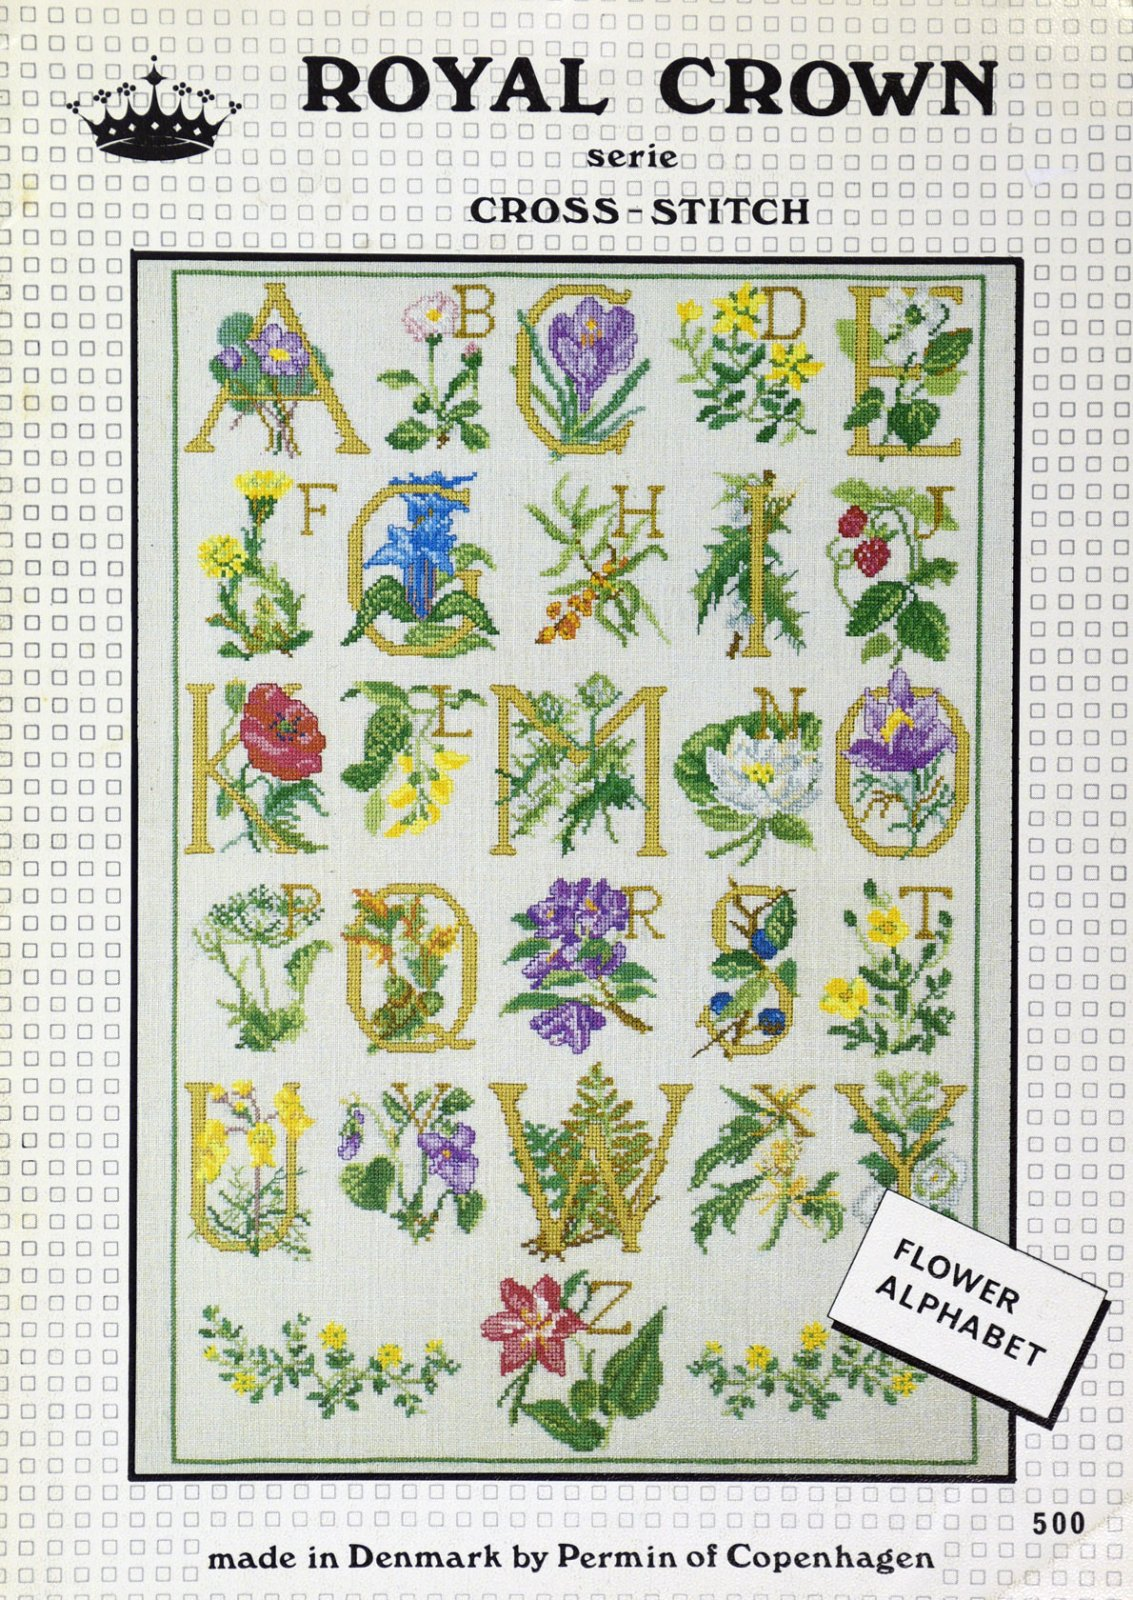 Flower Alphabet:  BF